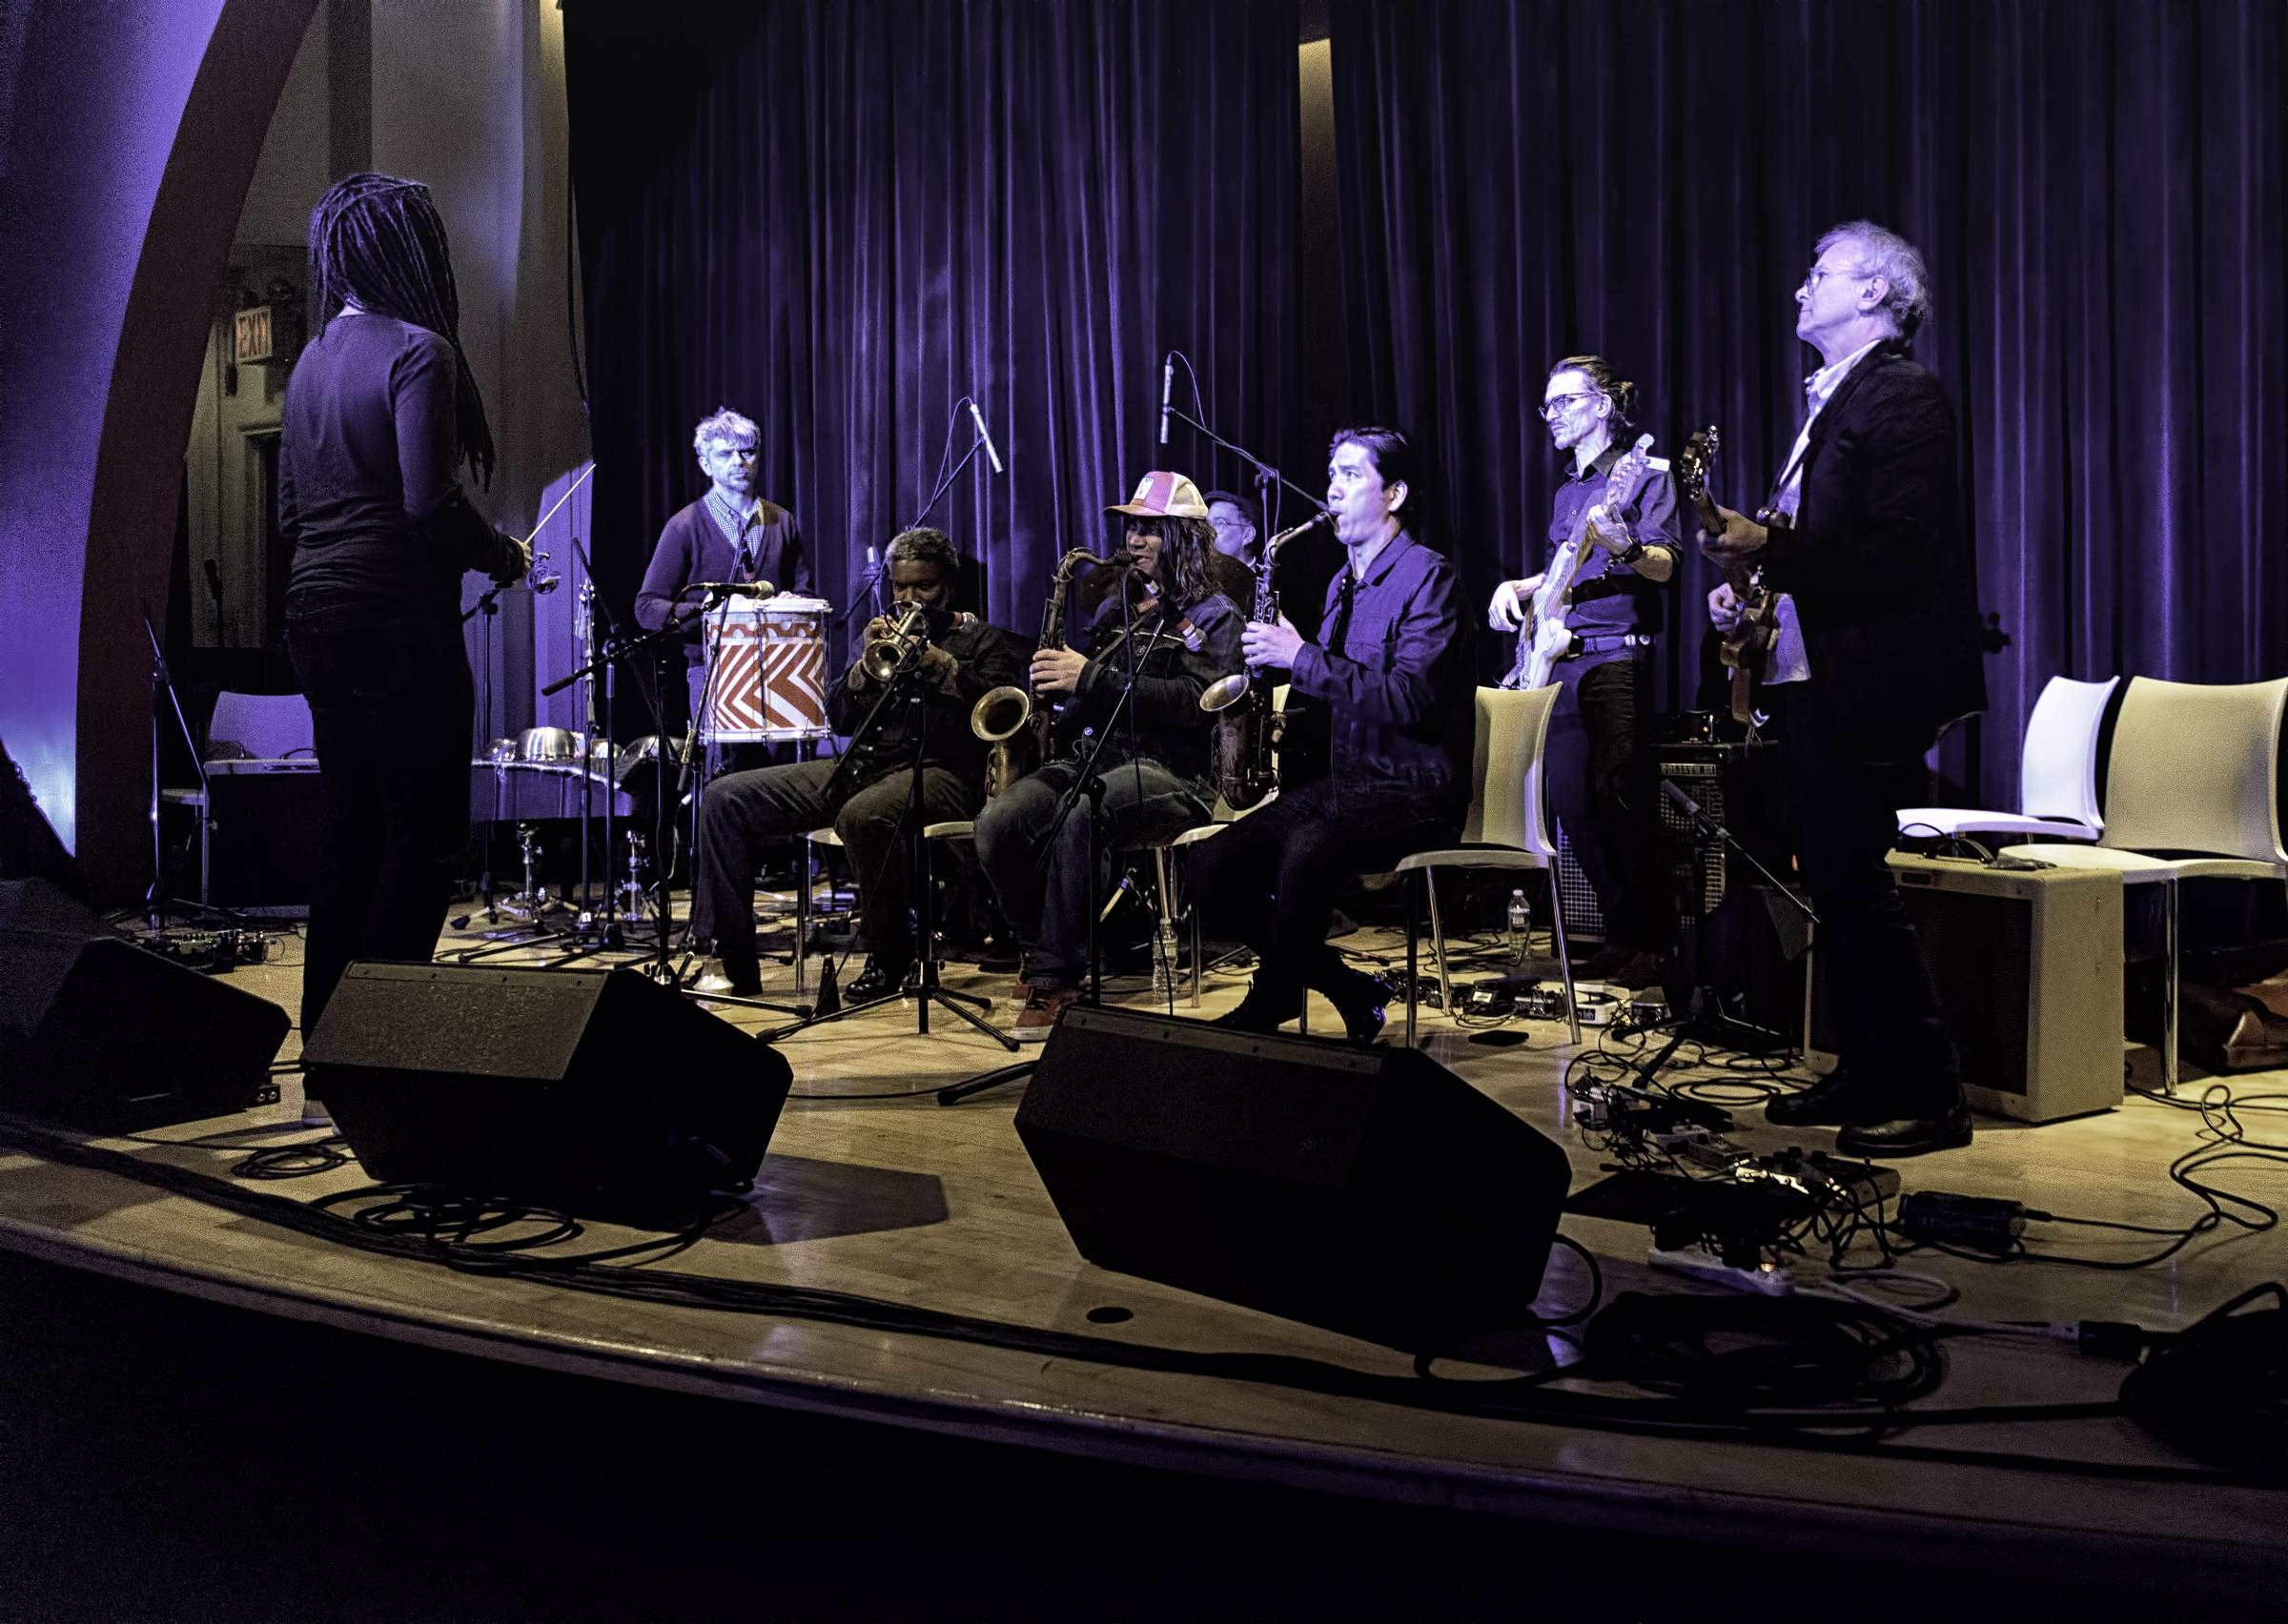 Brandon Ross, Mauro Refosco, Graham Haynes, Kenny Wollesen, Ilhan Ersahin, Jonathon Haffner, Michael Kiaer and Doug Wieselman With Nublu Orchestra At The NYC Winter Jazzfest 2016